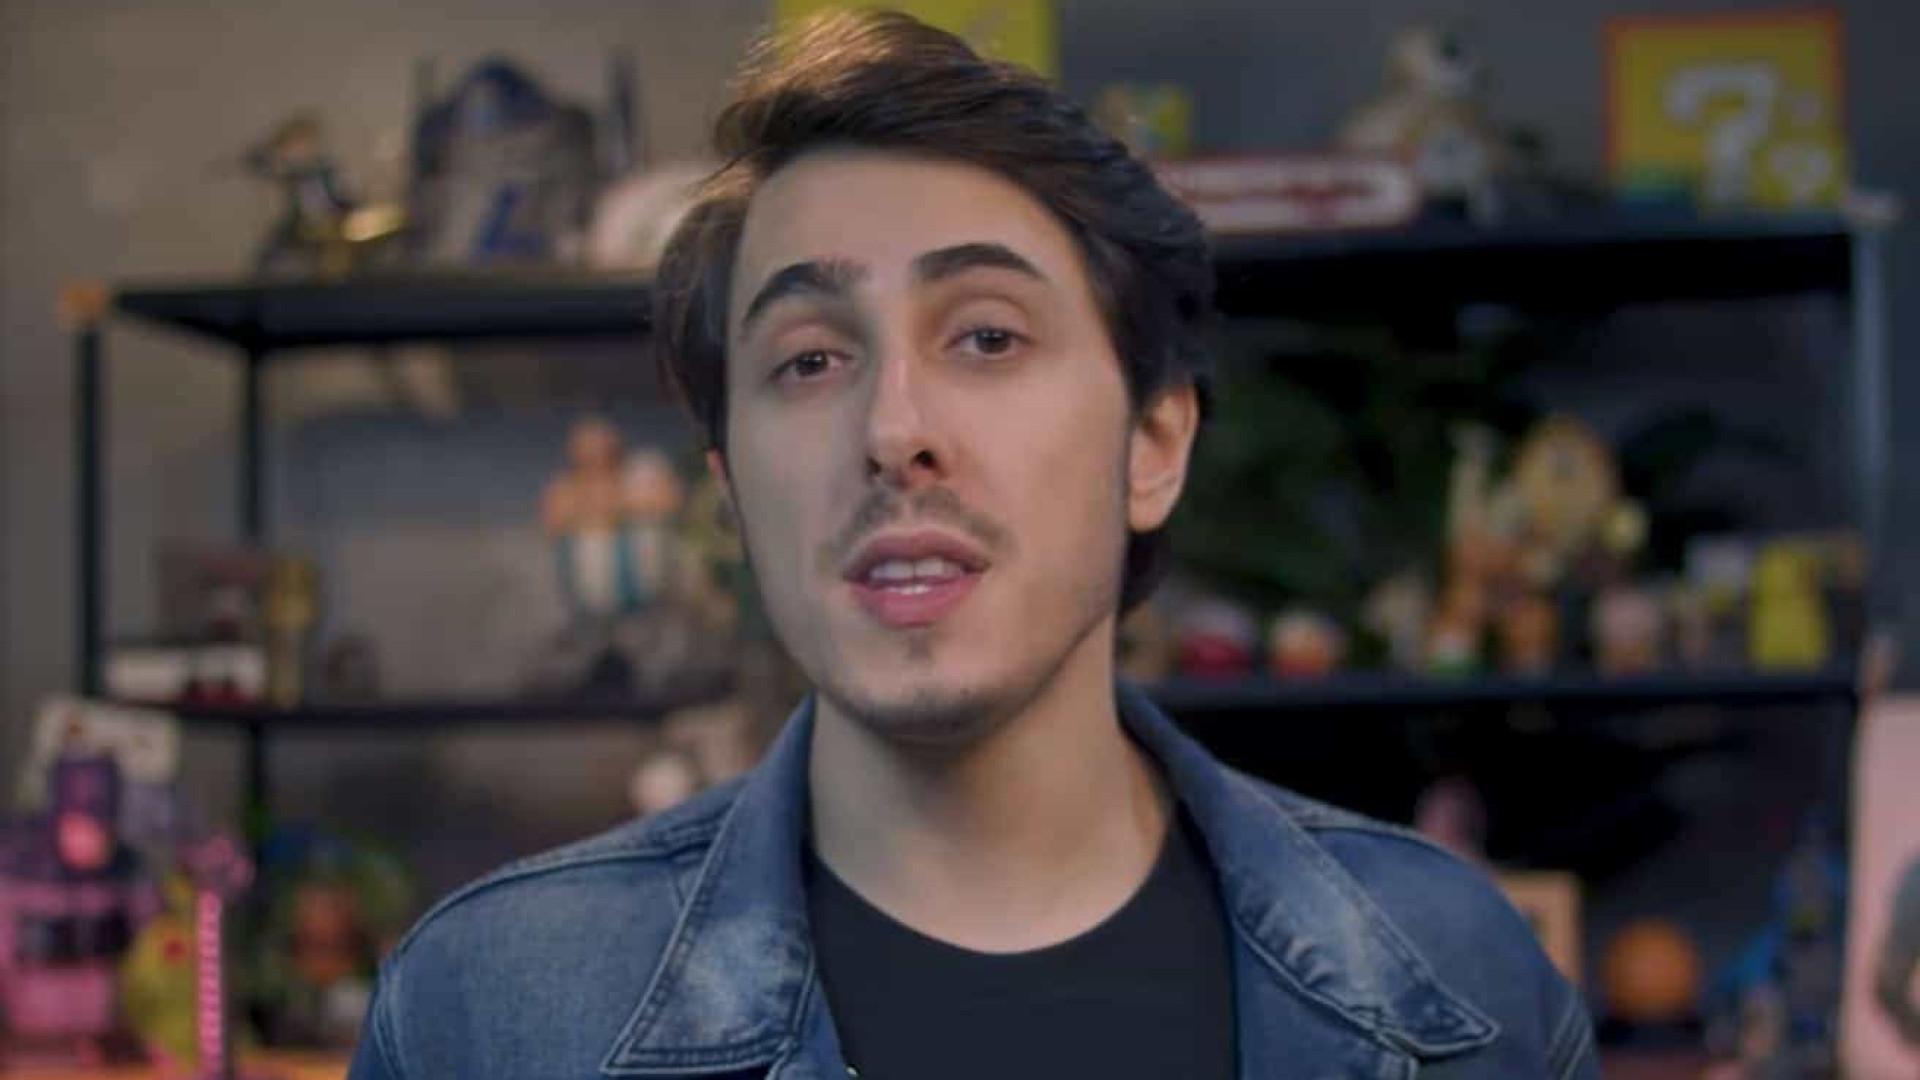 Felipe Castanhari diz que Marcius Melhem quer censurar quem apoia Dani Calabresa